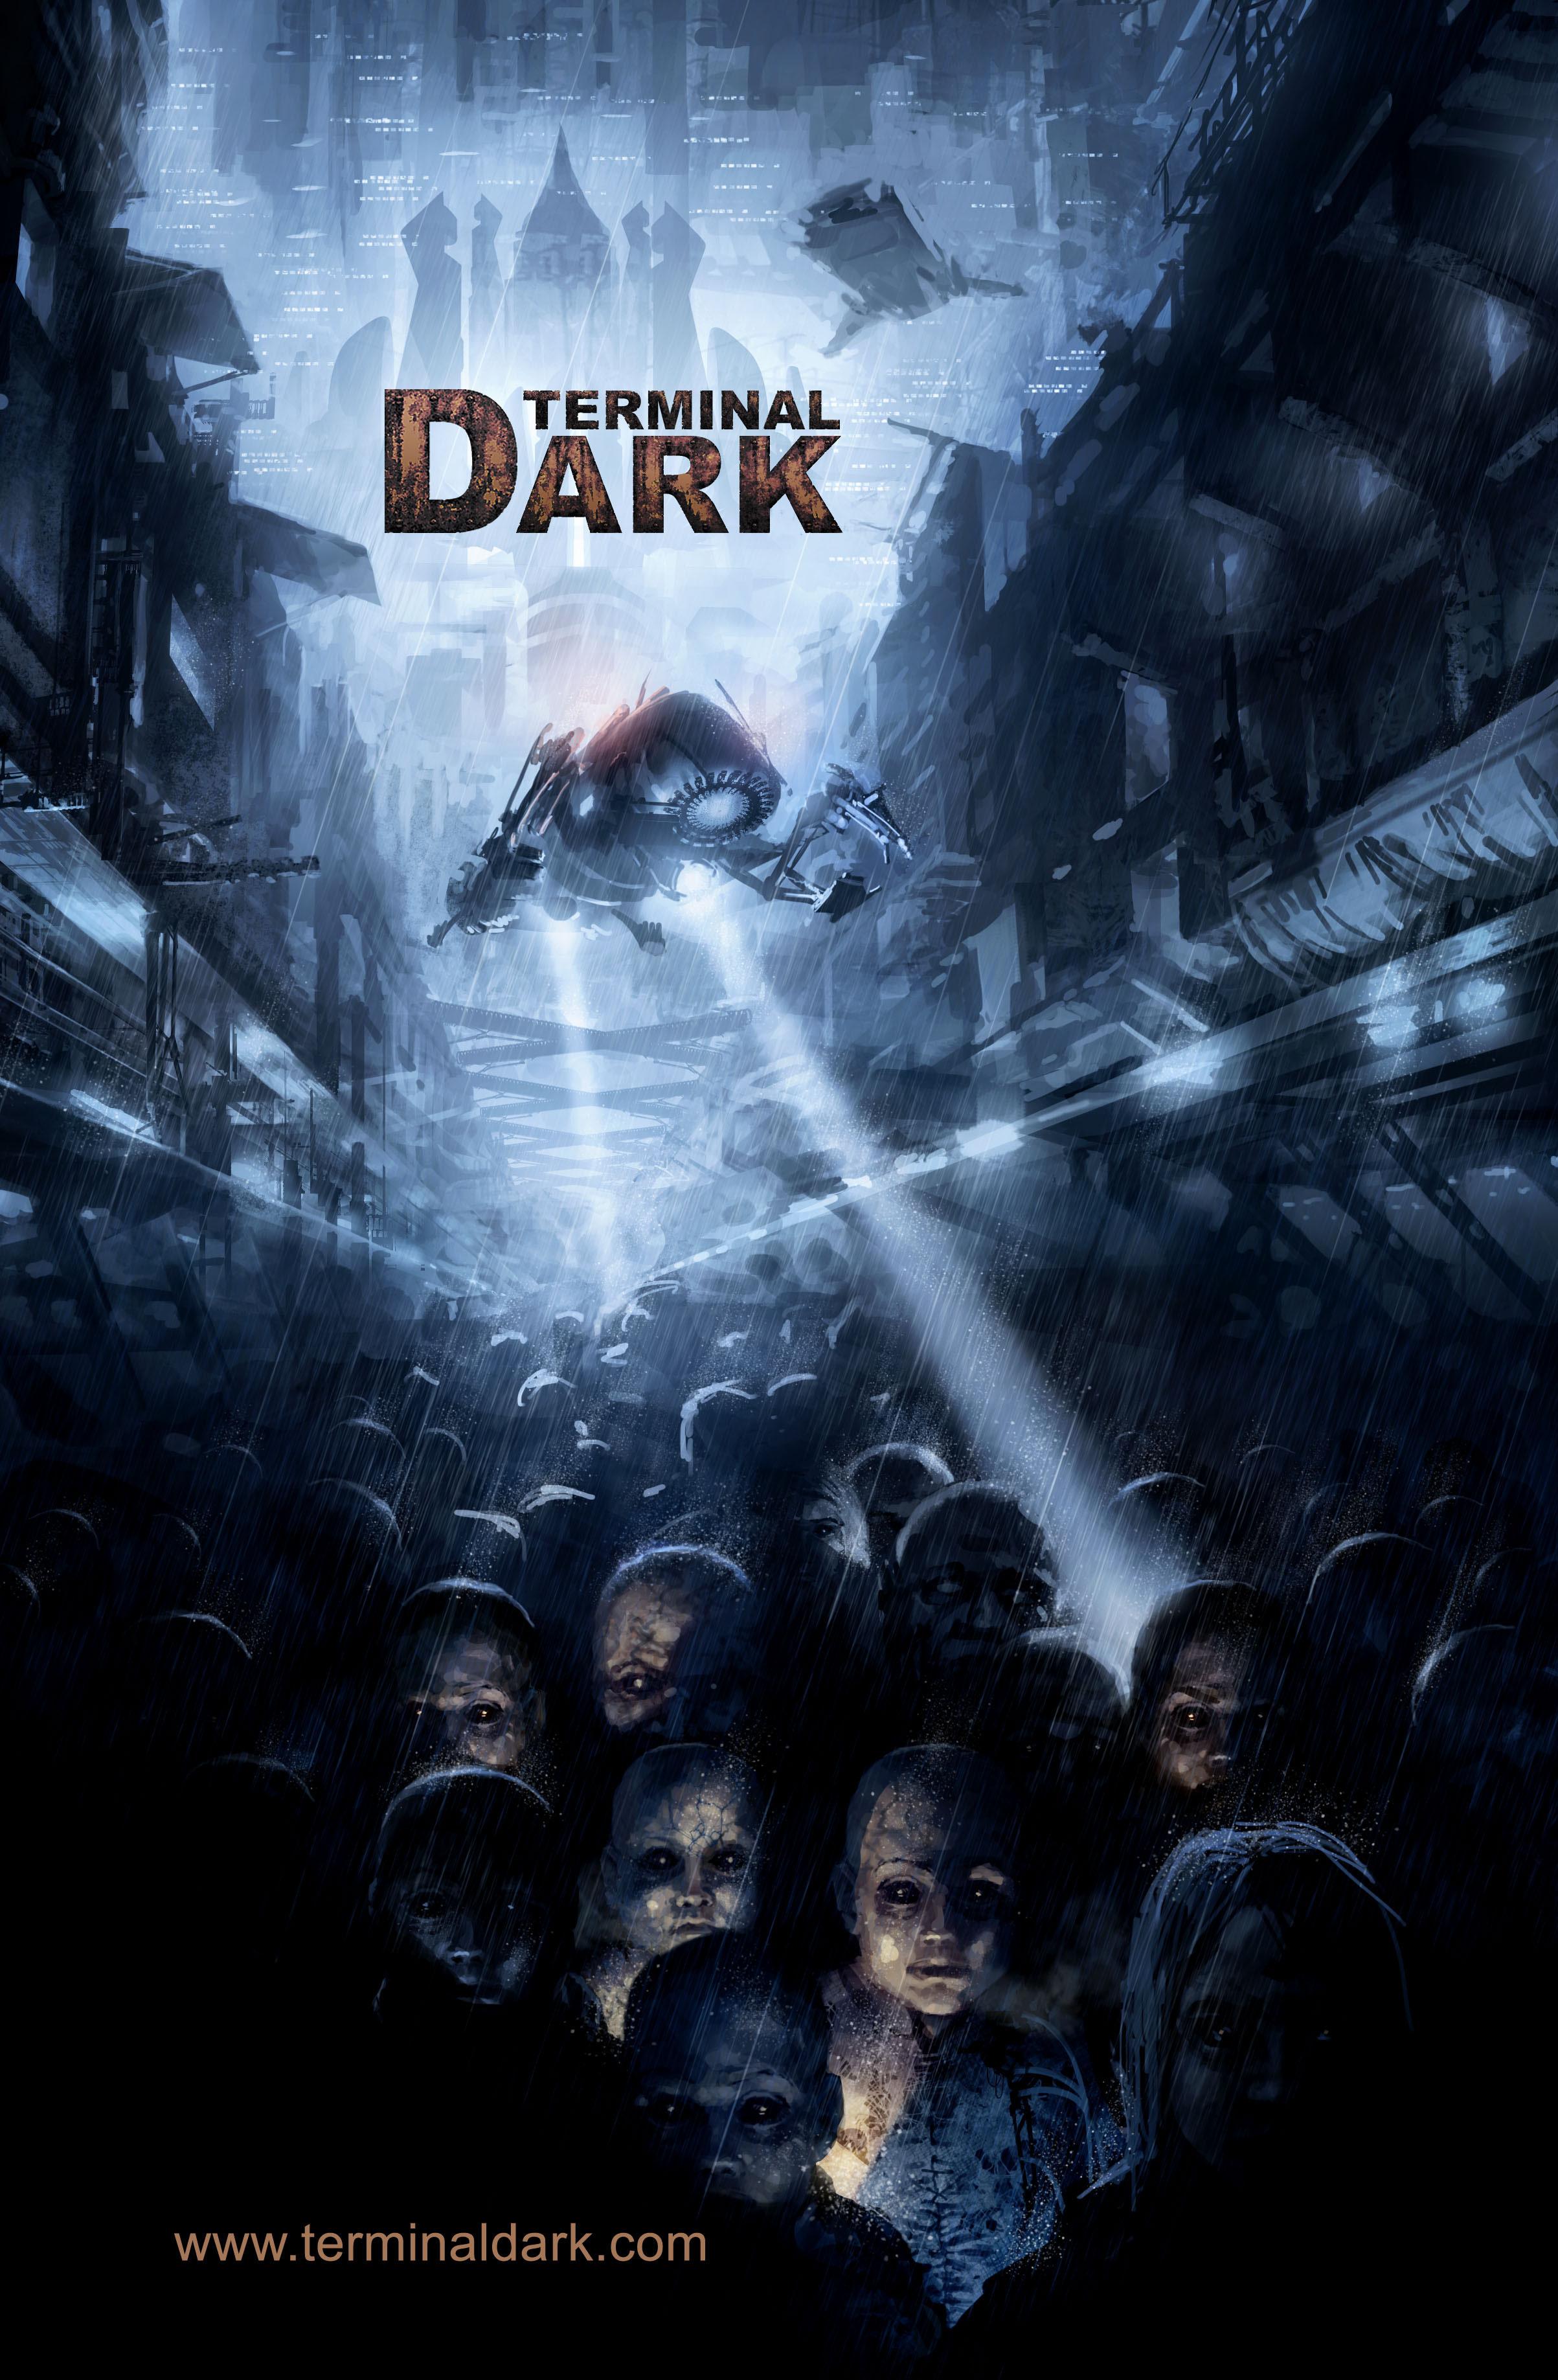 Novel hookup with the dark bab 9